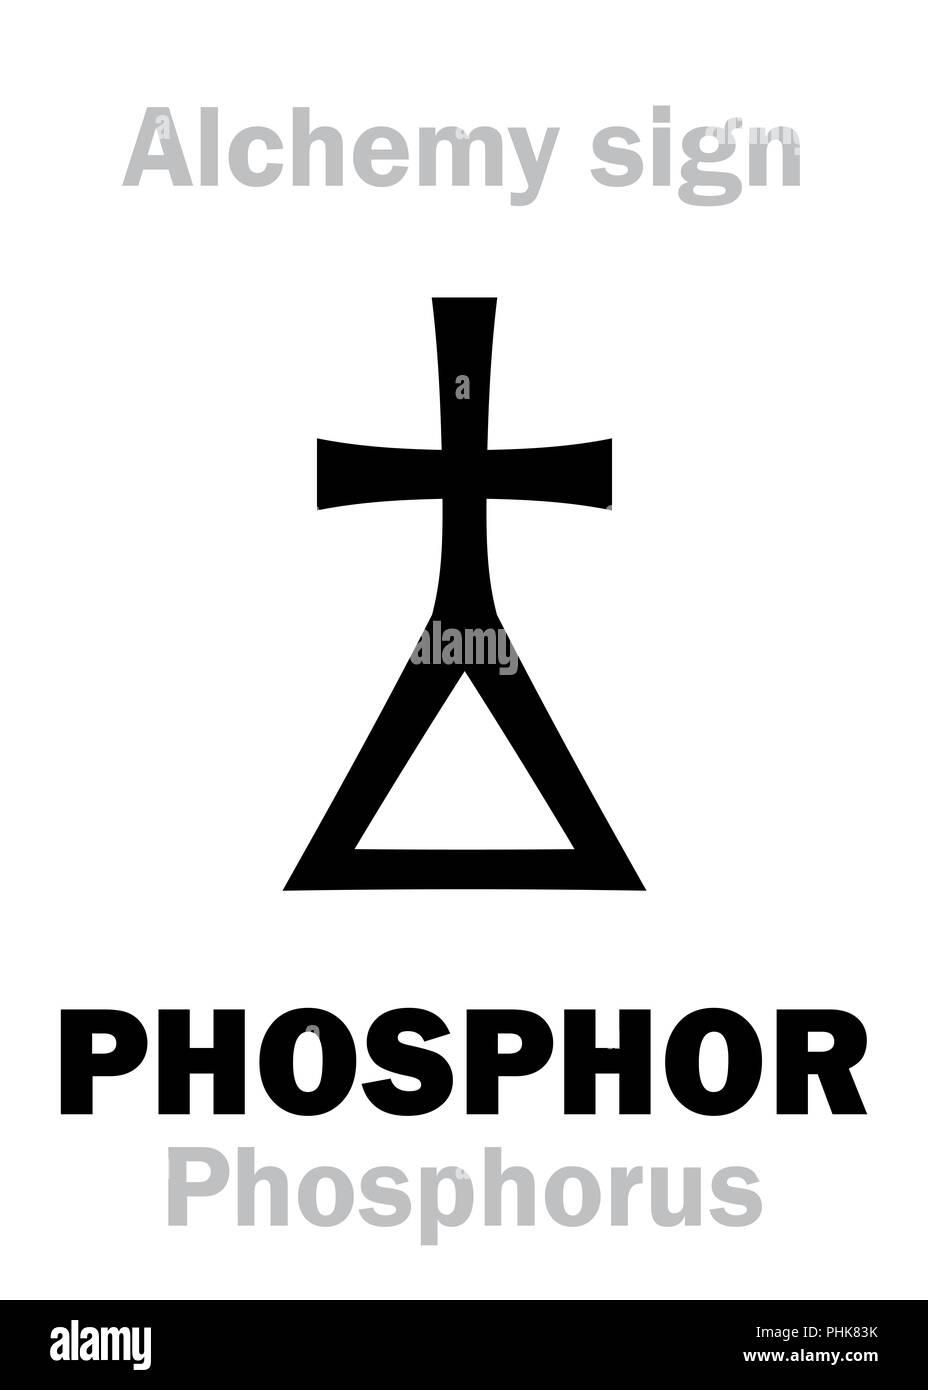 Alchemy: PHOSPHOR (Phosphorus) - Stock Image